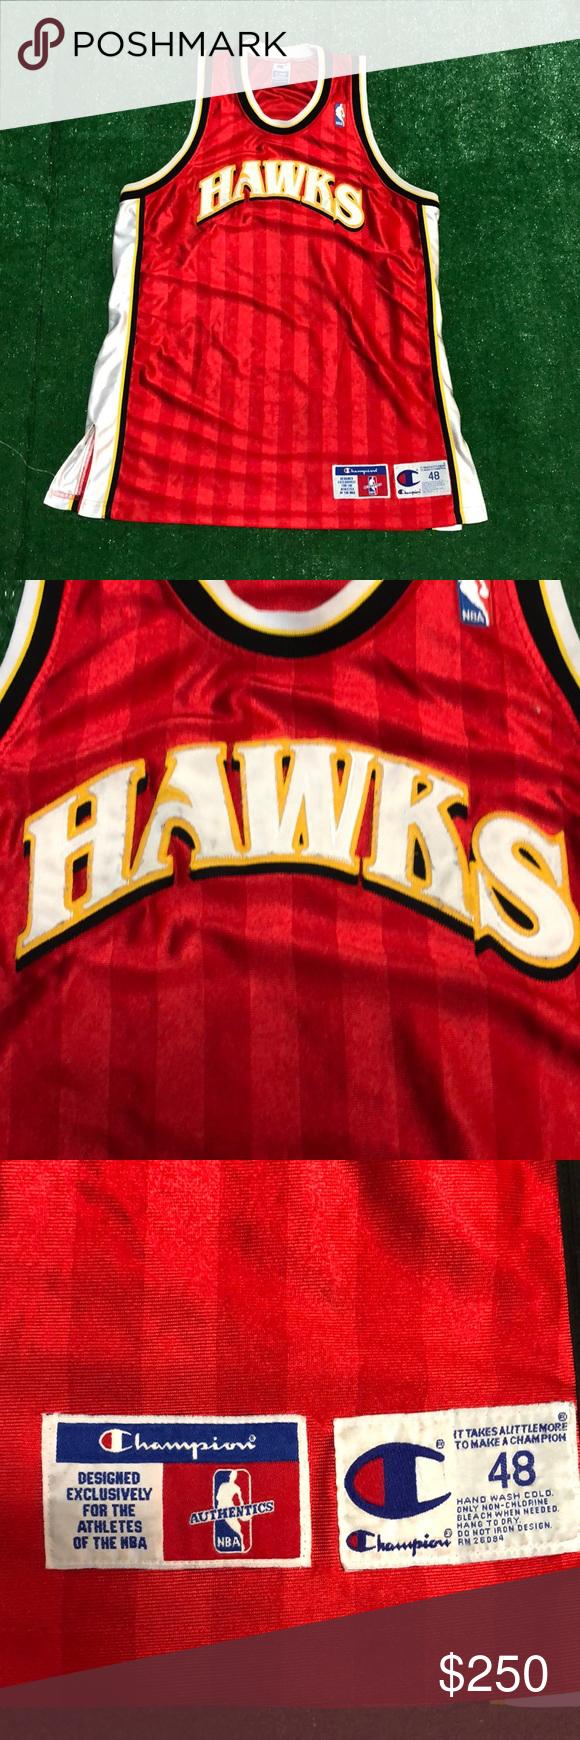 d853b6f27ec9 Blank Authentic NBA Atlanta Hawks Champion Jersey Rare vintage NBA  Authentic Blank Atlanta Hawks Champion Basketball